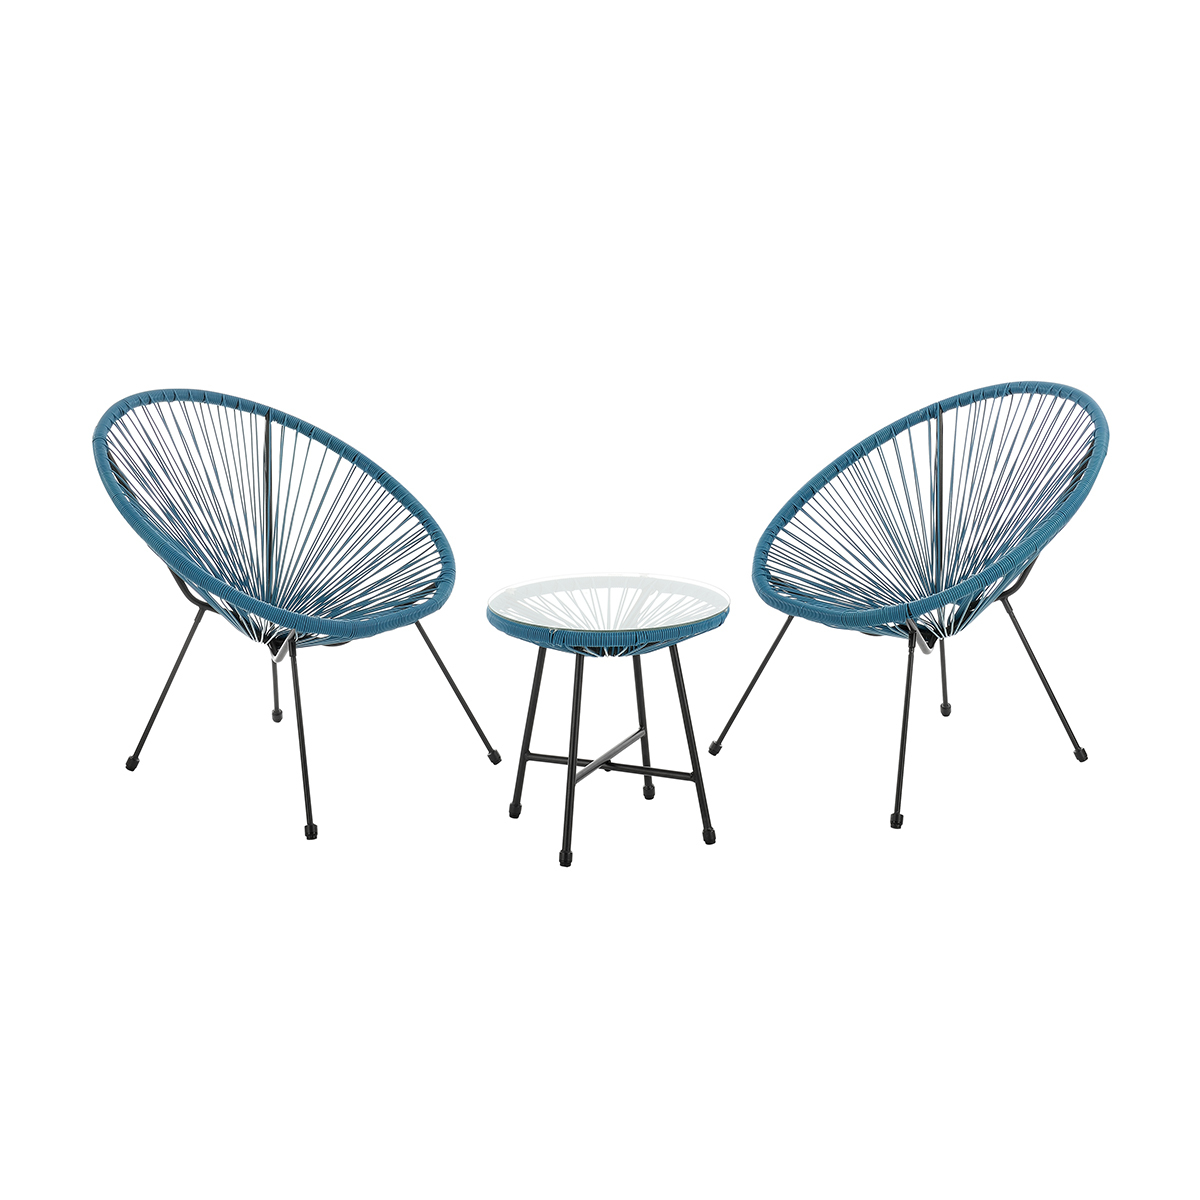 92258 SVITA BALI Balkon-Möbel 3-tlg. Polyrattan Lounge-Set Balkon-Set Blau